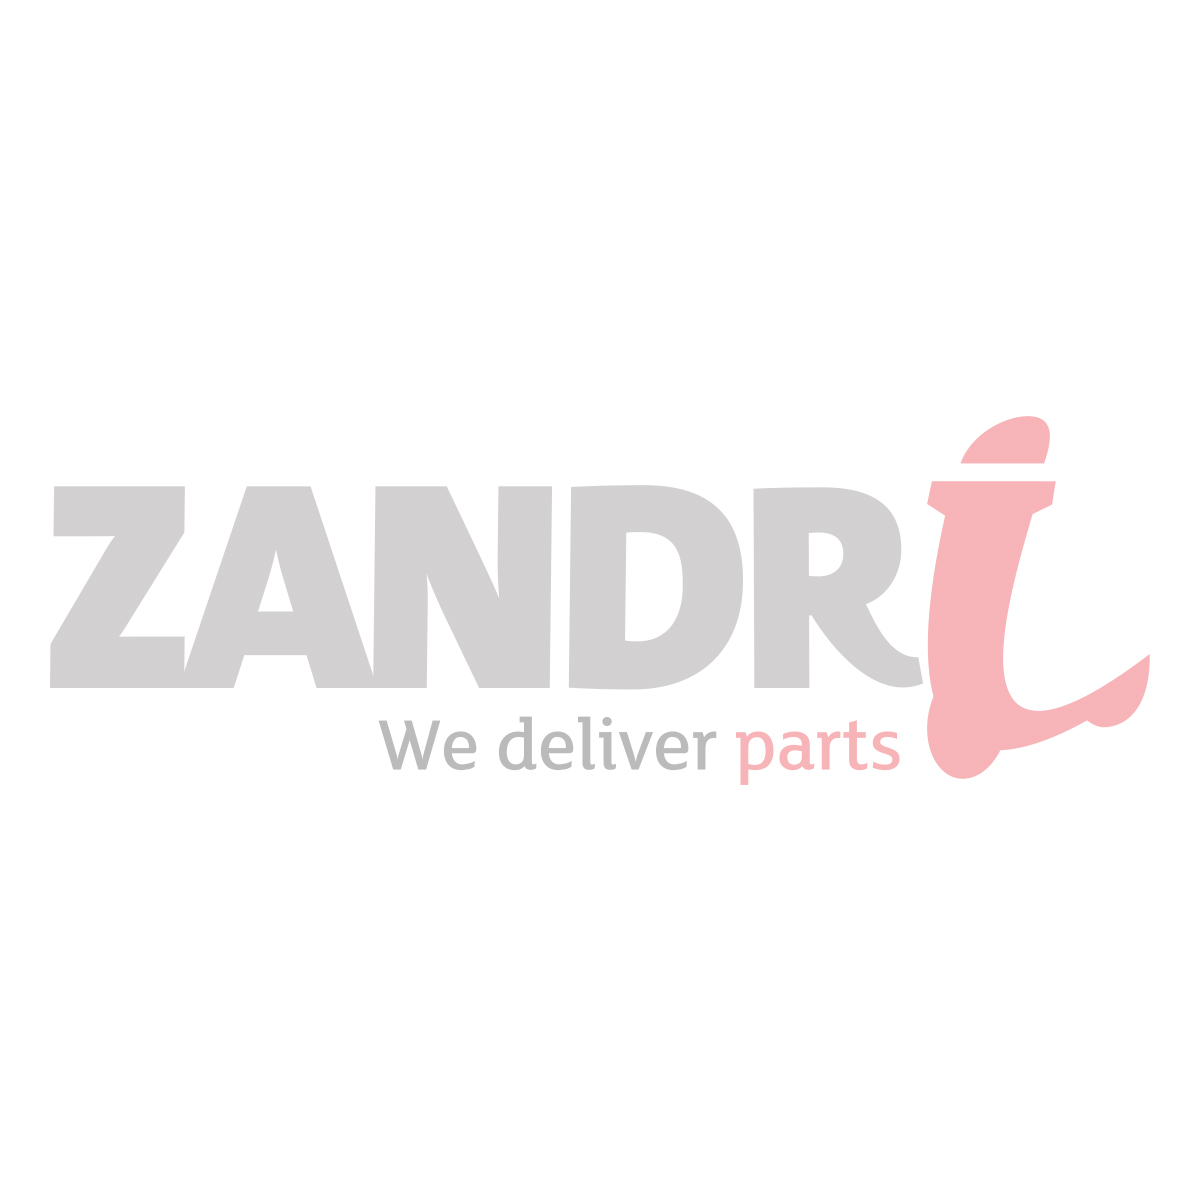 https://www.zandri.nl/media/catalog/product/cache/1/image/1200x1200/67754e084e727ef5b5973a4a9e3c5e34/s/p/sp50_33720-aca7-9000agm_kenteken_verlichting_origineel_sp_252_1.jpg